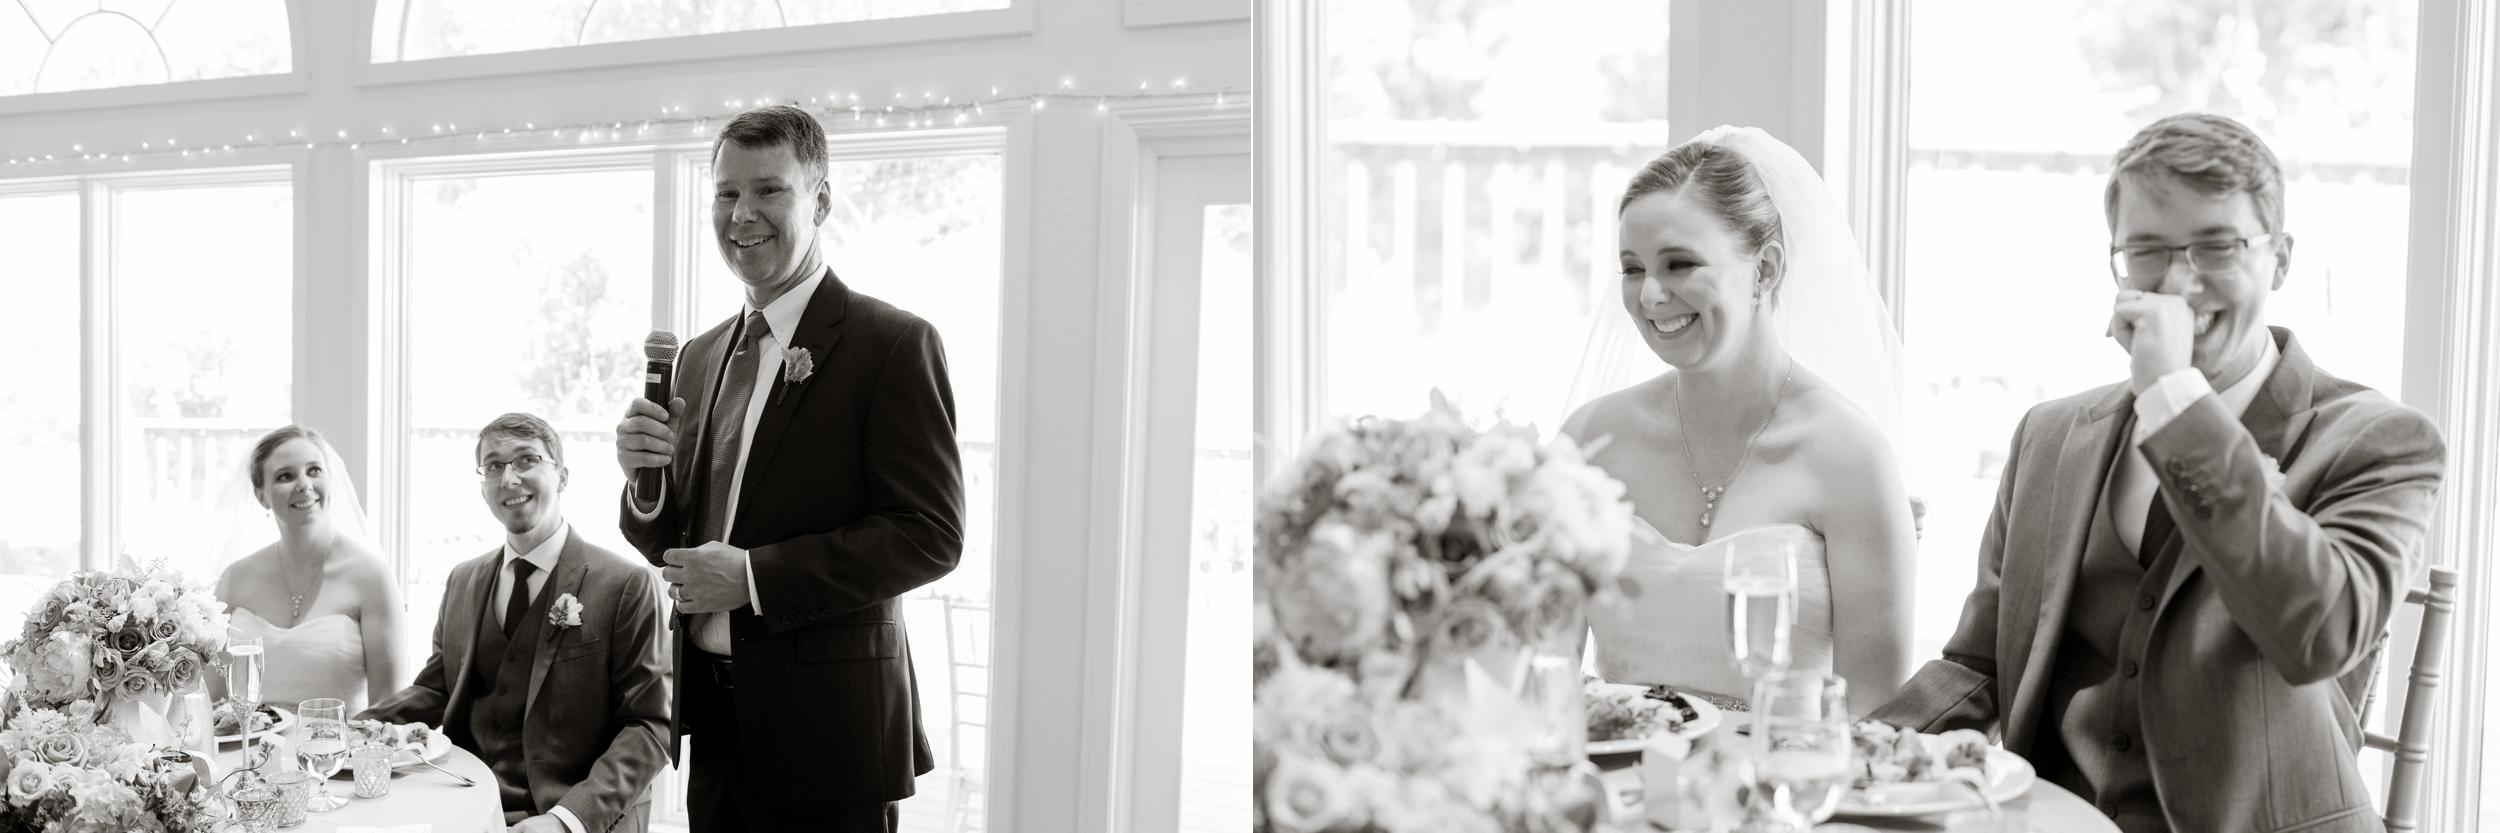 elliston-vineyards-morning-wedding-vivianchen-040_WEB.jpg